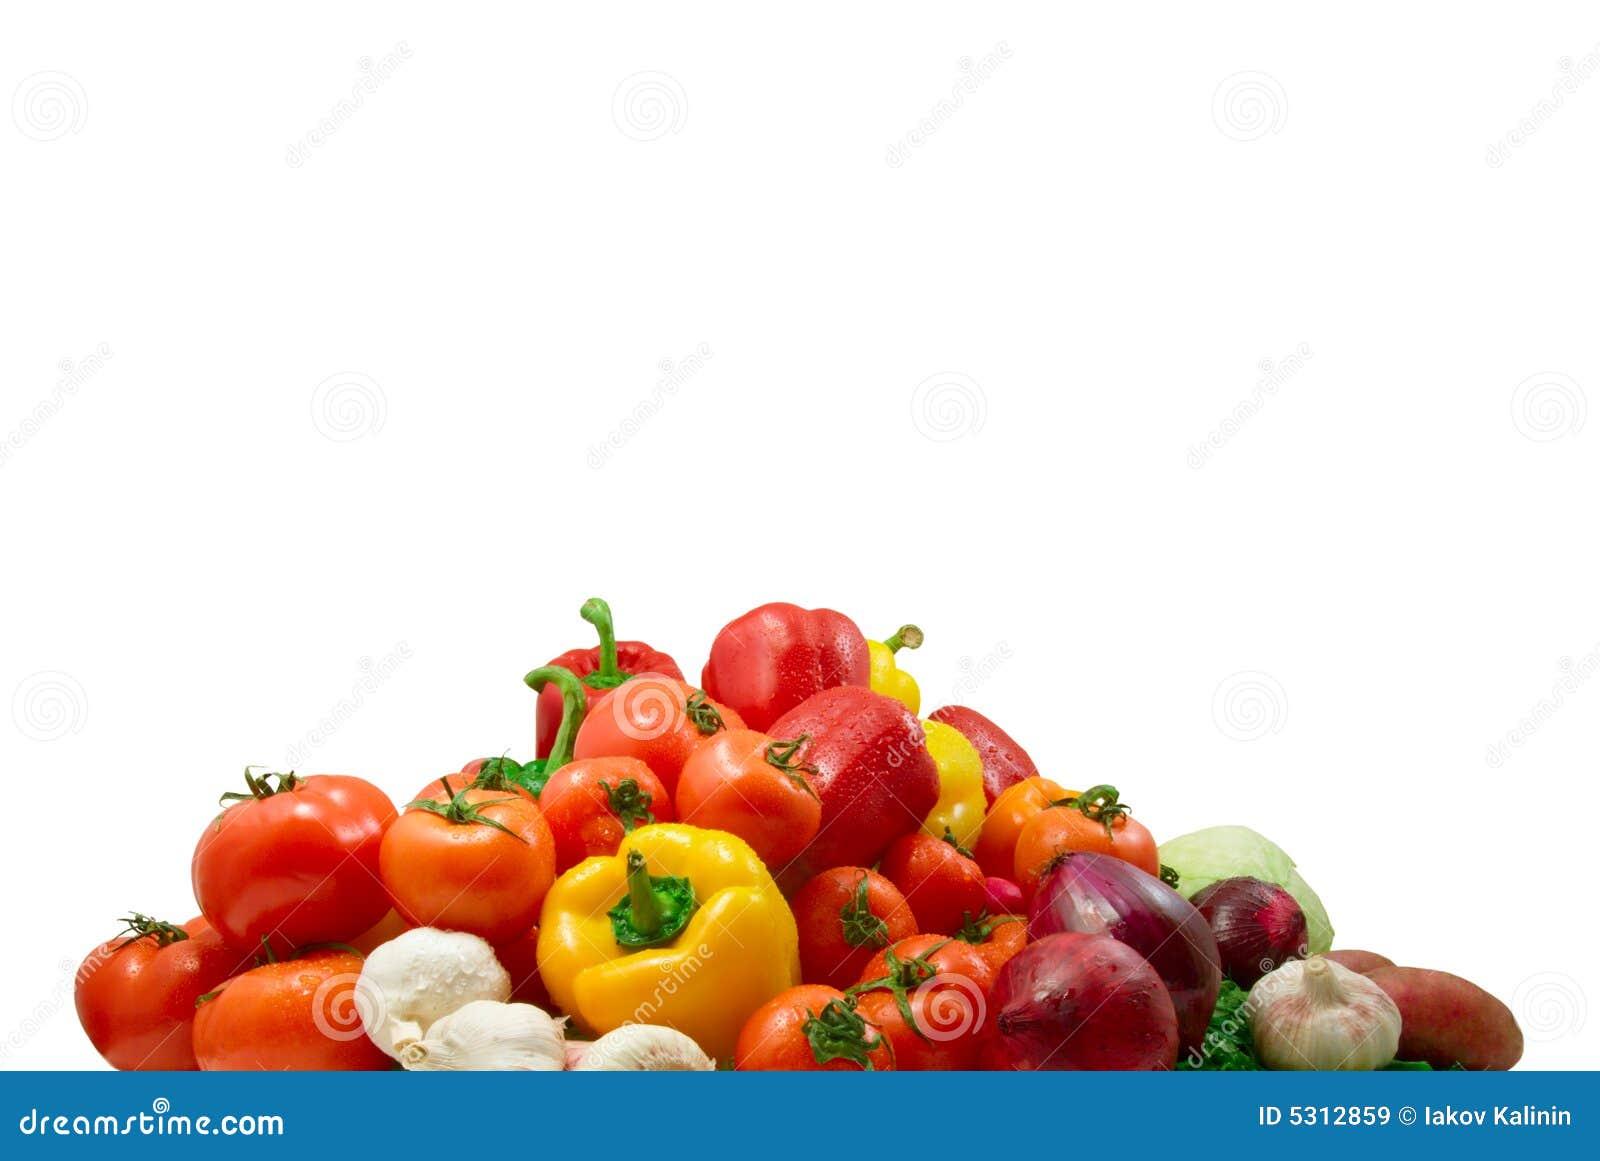 Download Verdure bagnate immagine stock. Immagine di crop, spuntino - 5312859